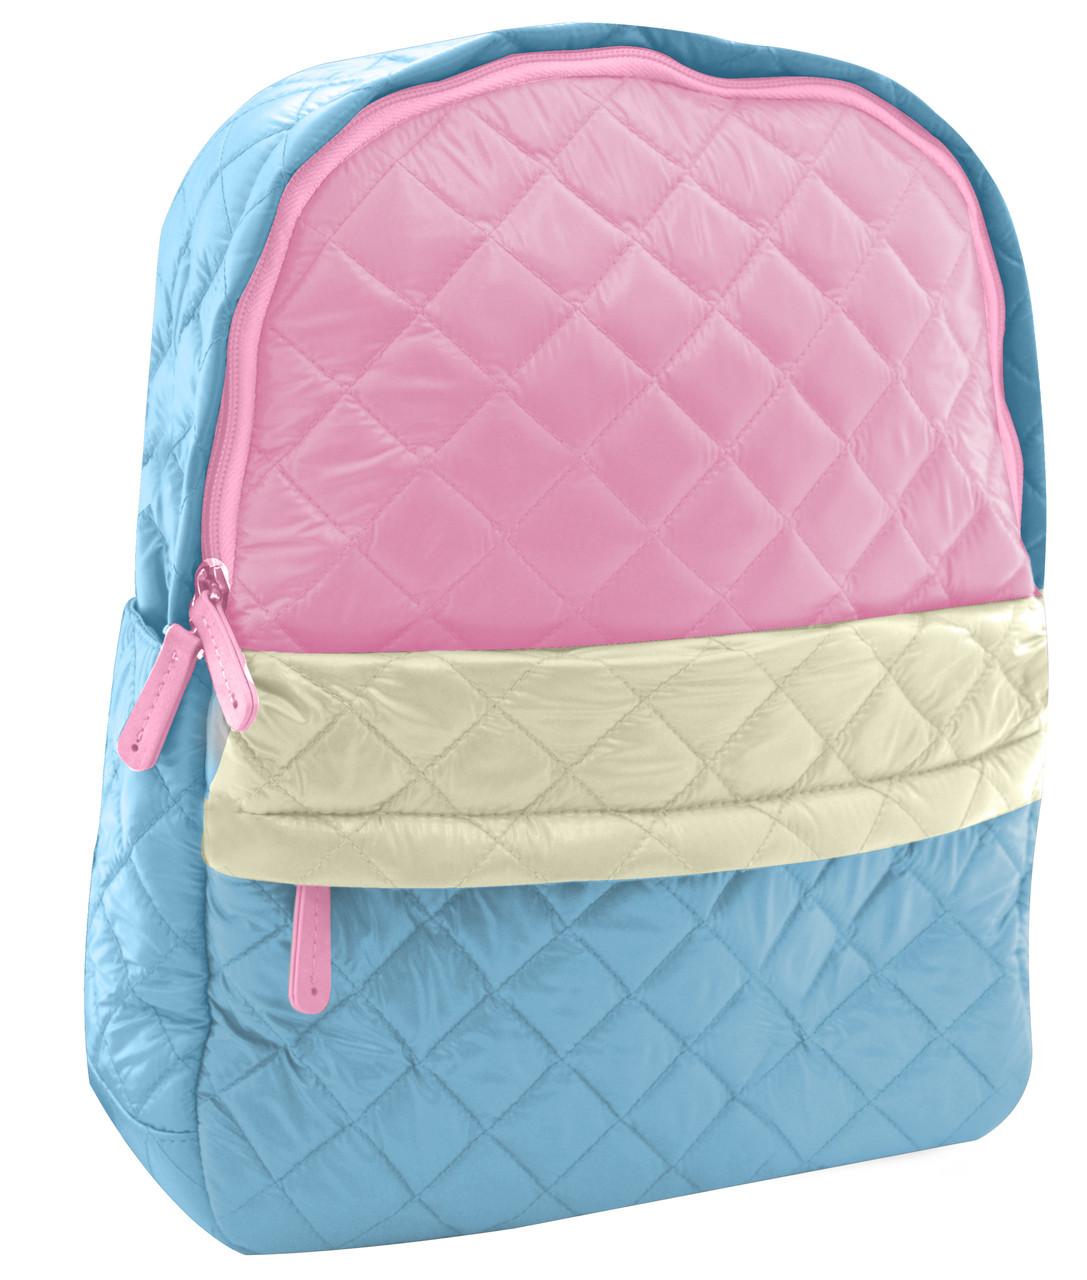 Рюкзак подростковый ST-14 Glam 06, 35*27*11